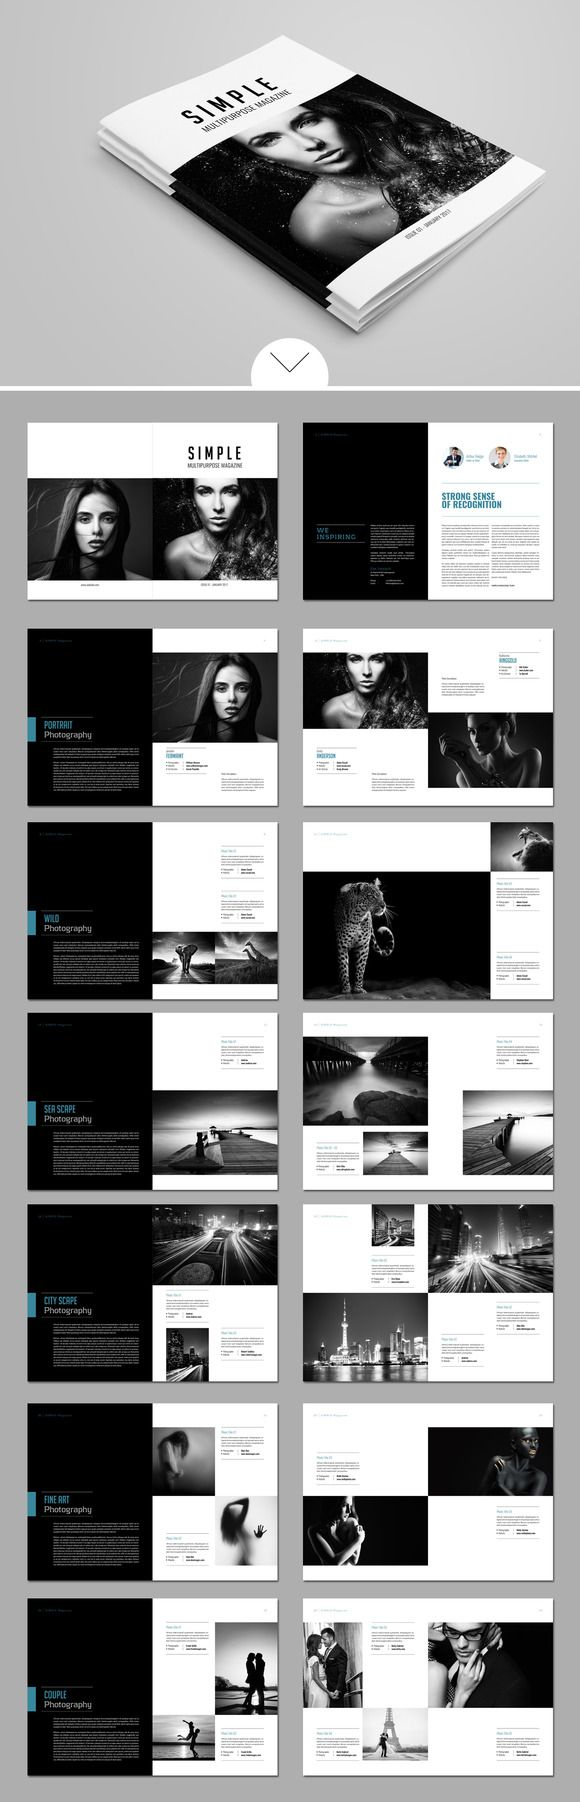 @newkoko2020 Simple Magazine Template by tujuhbenua on @creativemarket